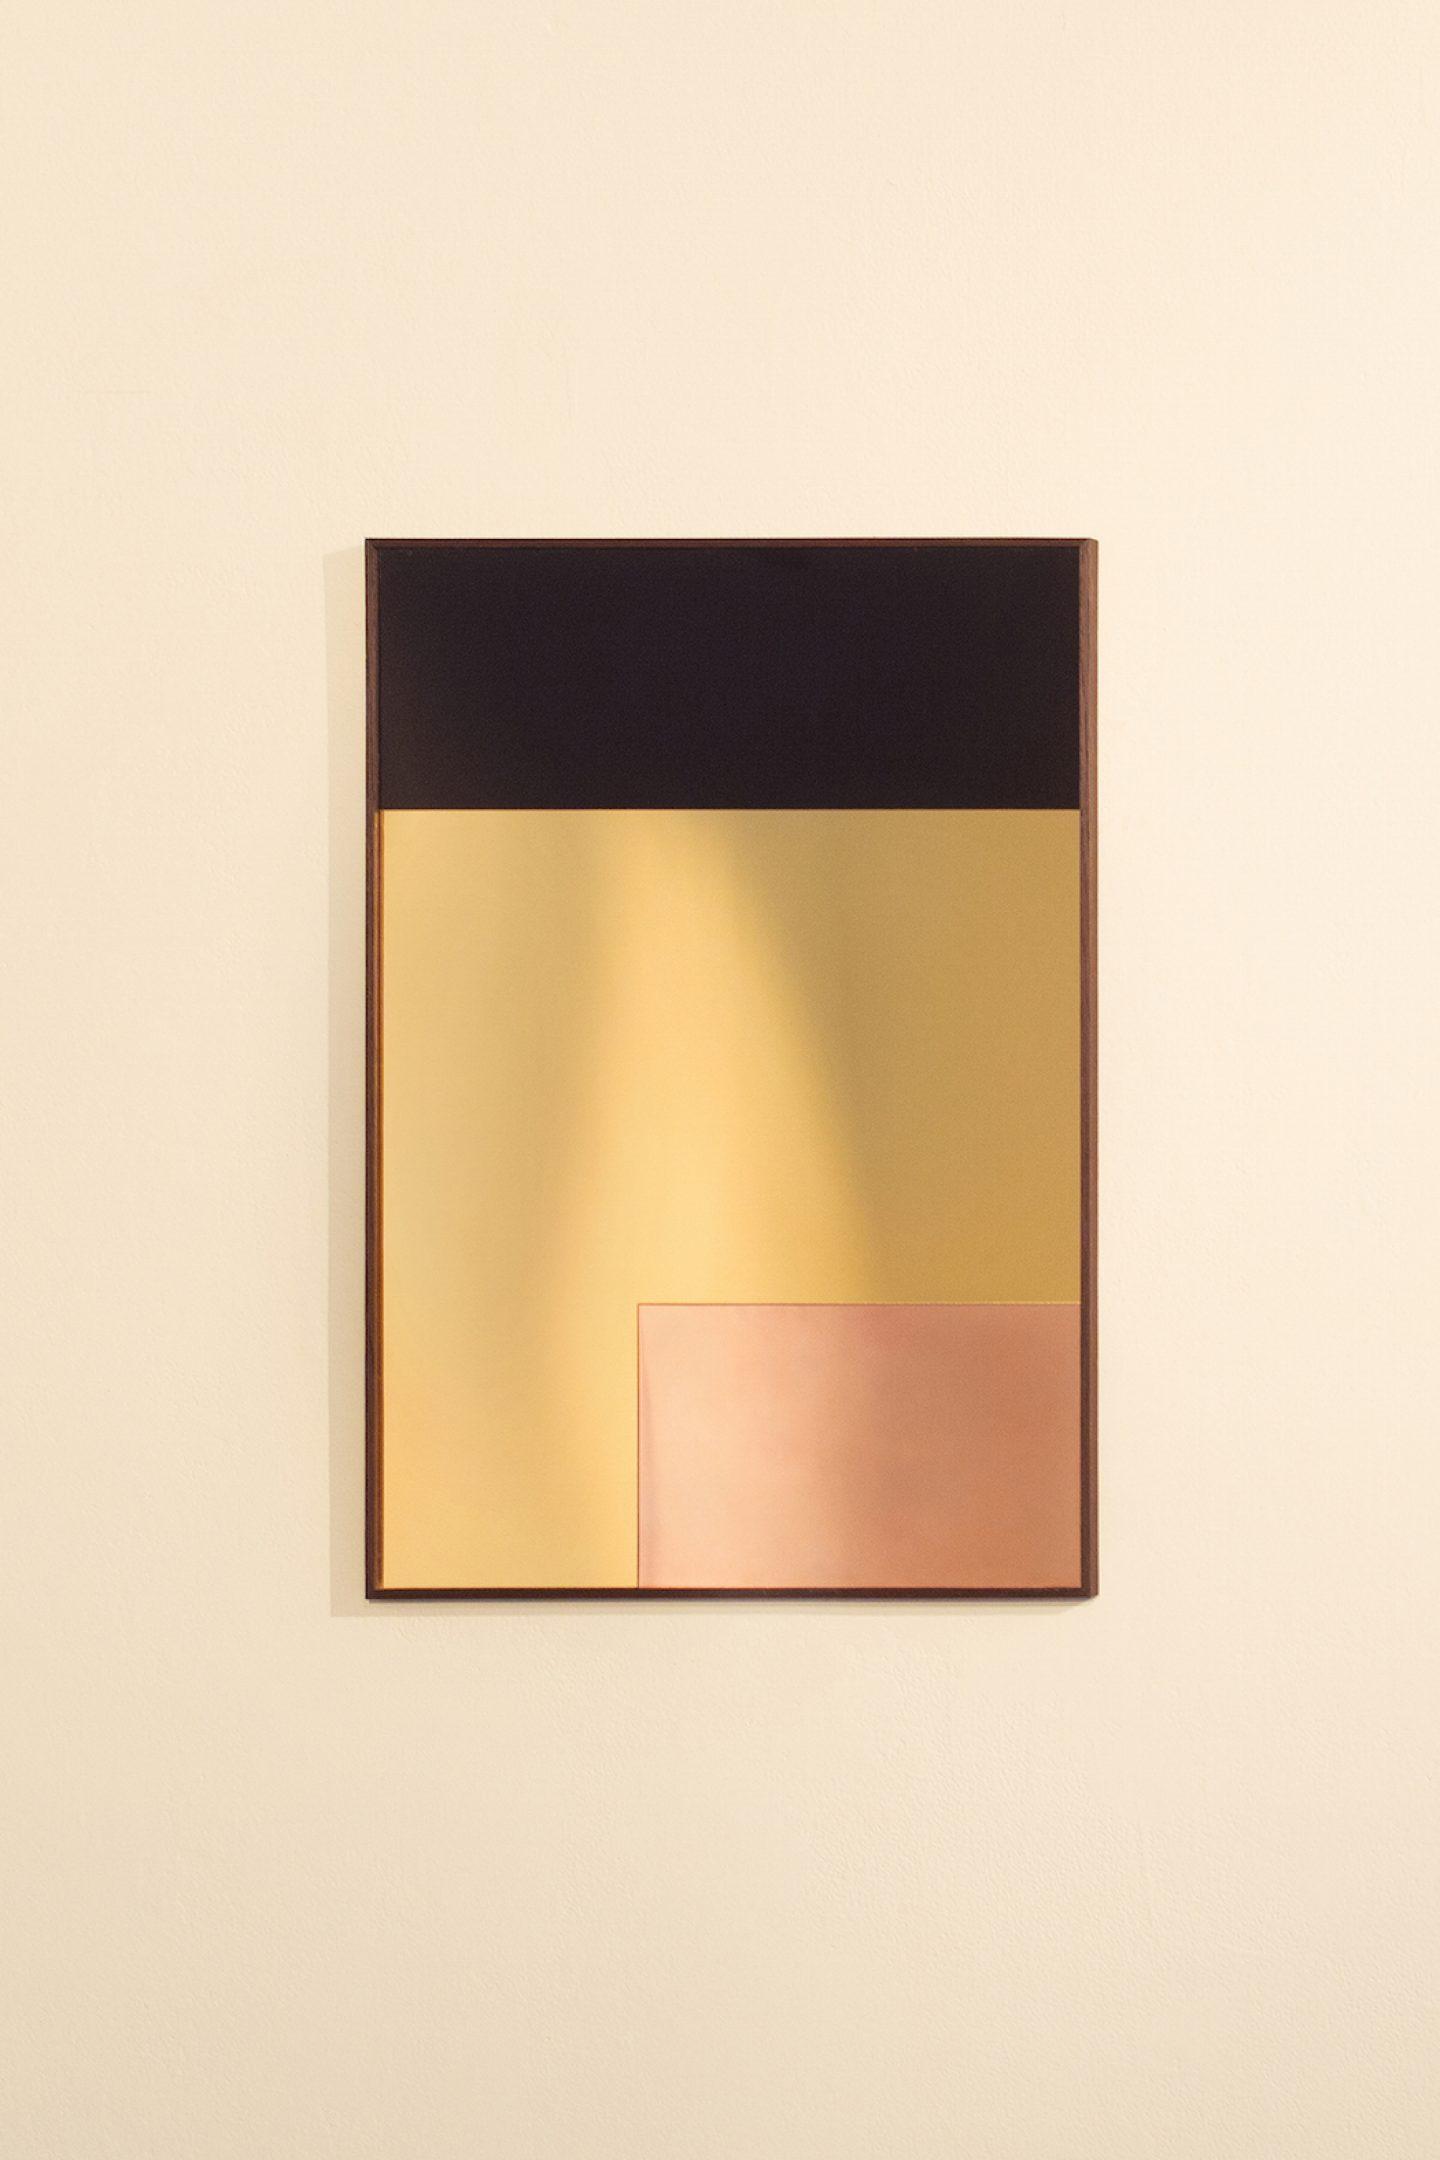 ninacho_design-Constructivist Mirror Series by Nina Cho 1